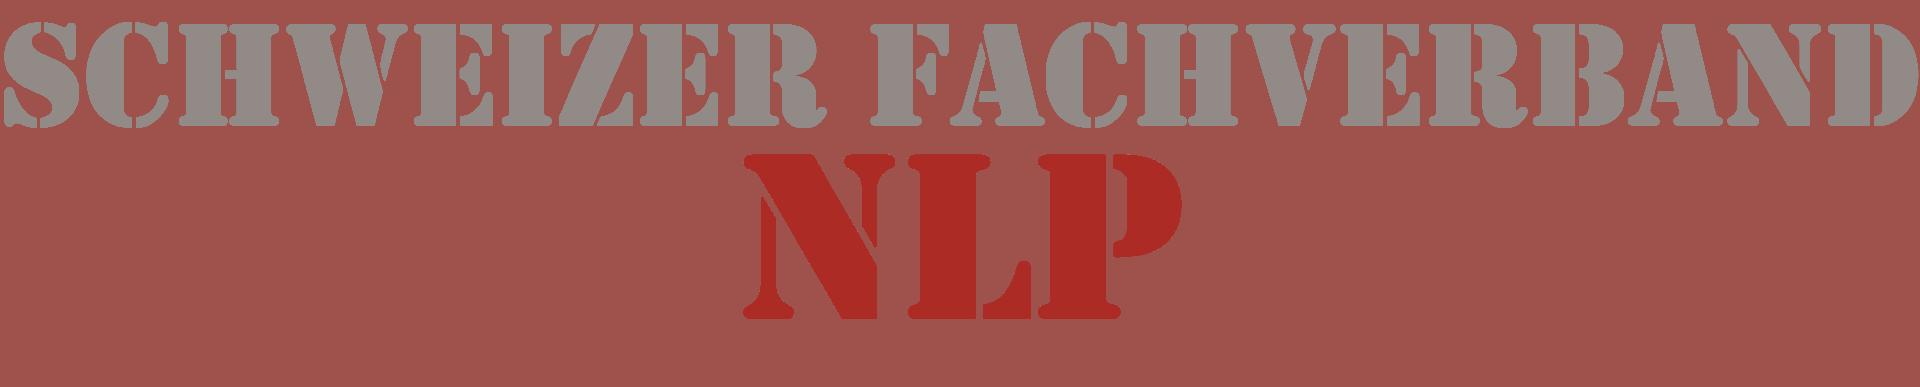 vpt-logo-nlp